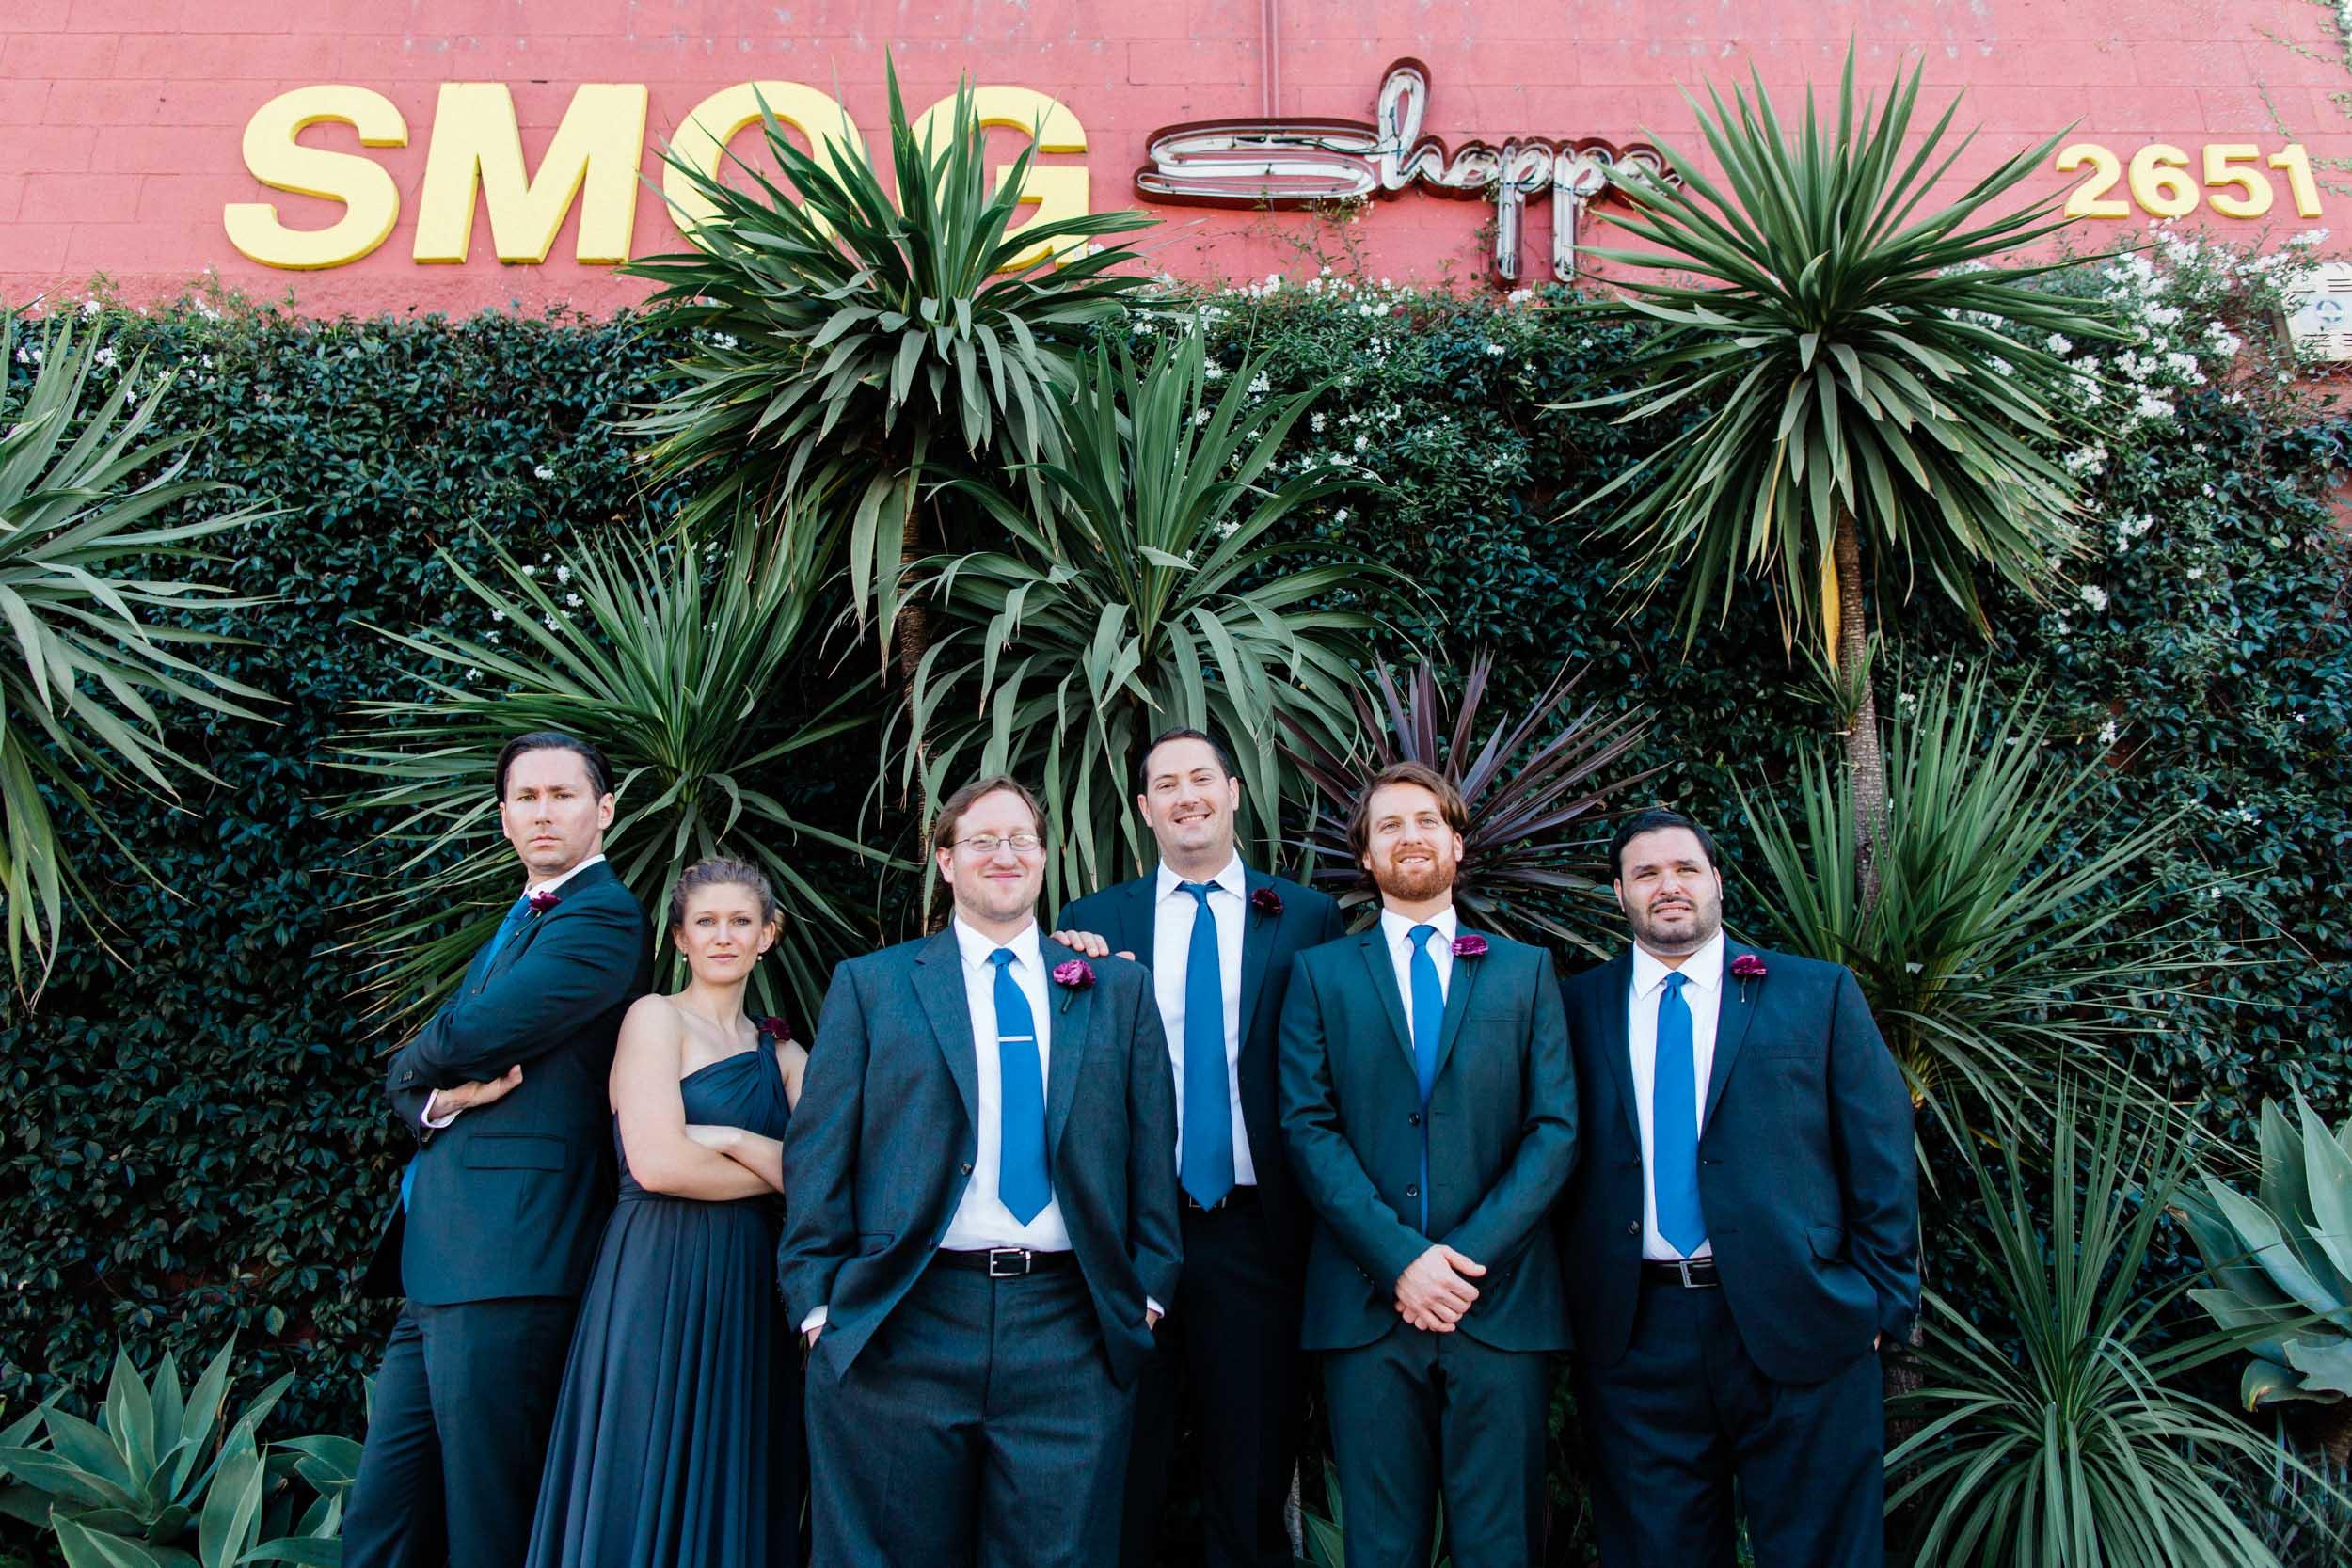 BKM-Photography-Smog-Shoppe-Culver-City-Wedding-Photographer-Culver-Hotel-0030.jpg